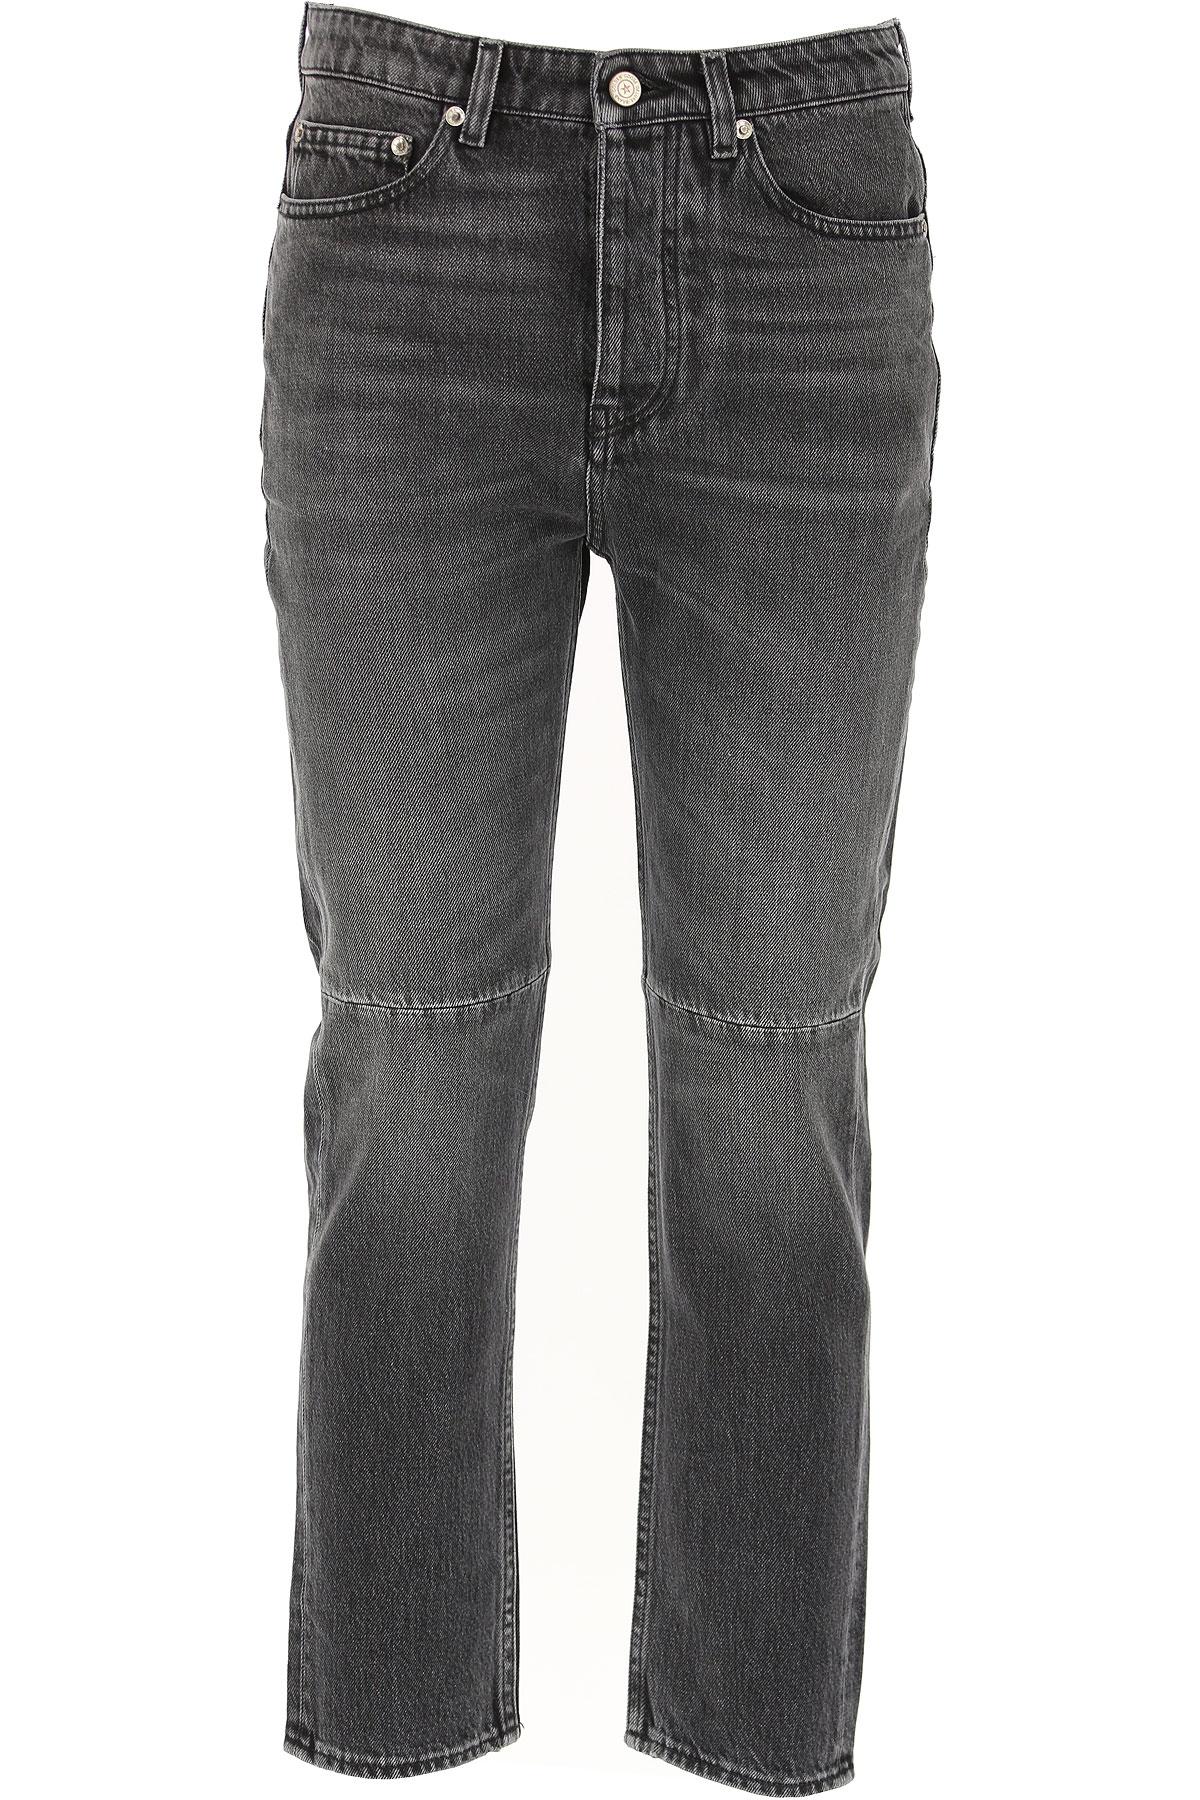 Golden Goose Jeans On Sale, Denim Grey, Cotton, 2017, 26 27 28 29